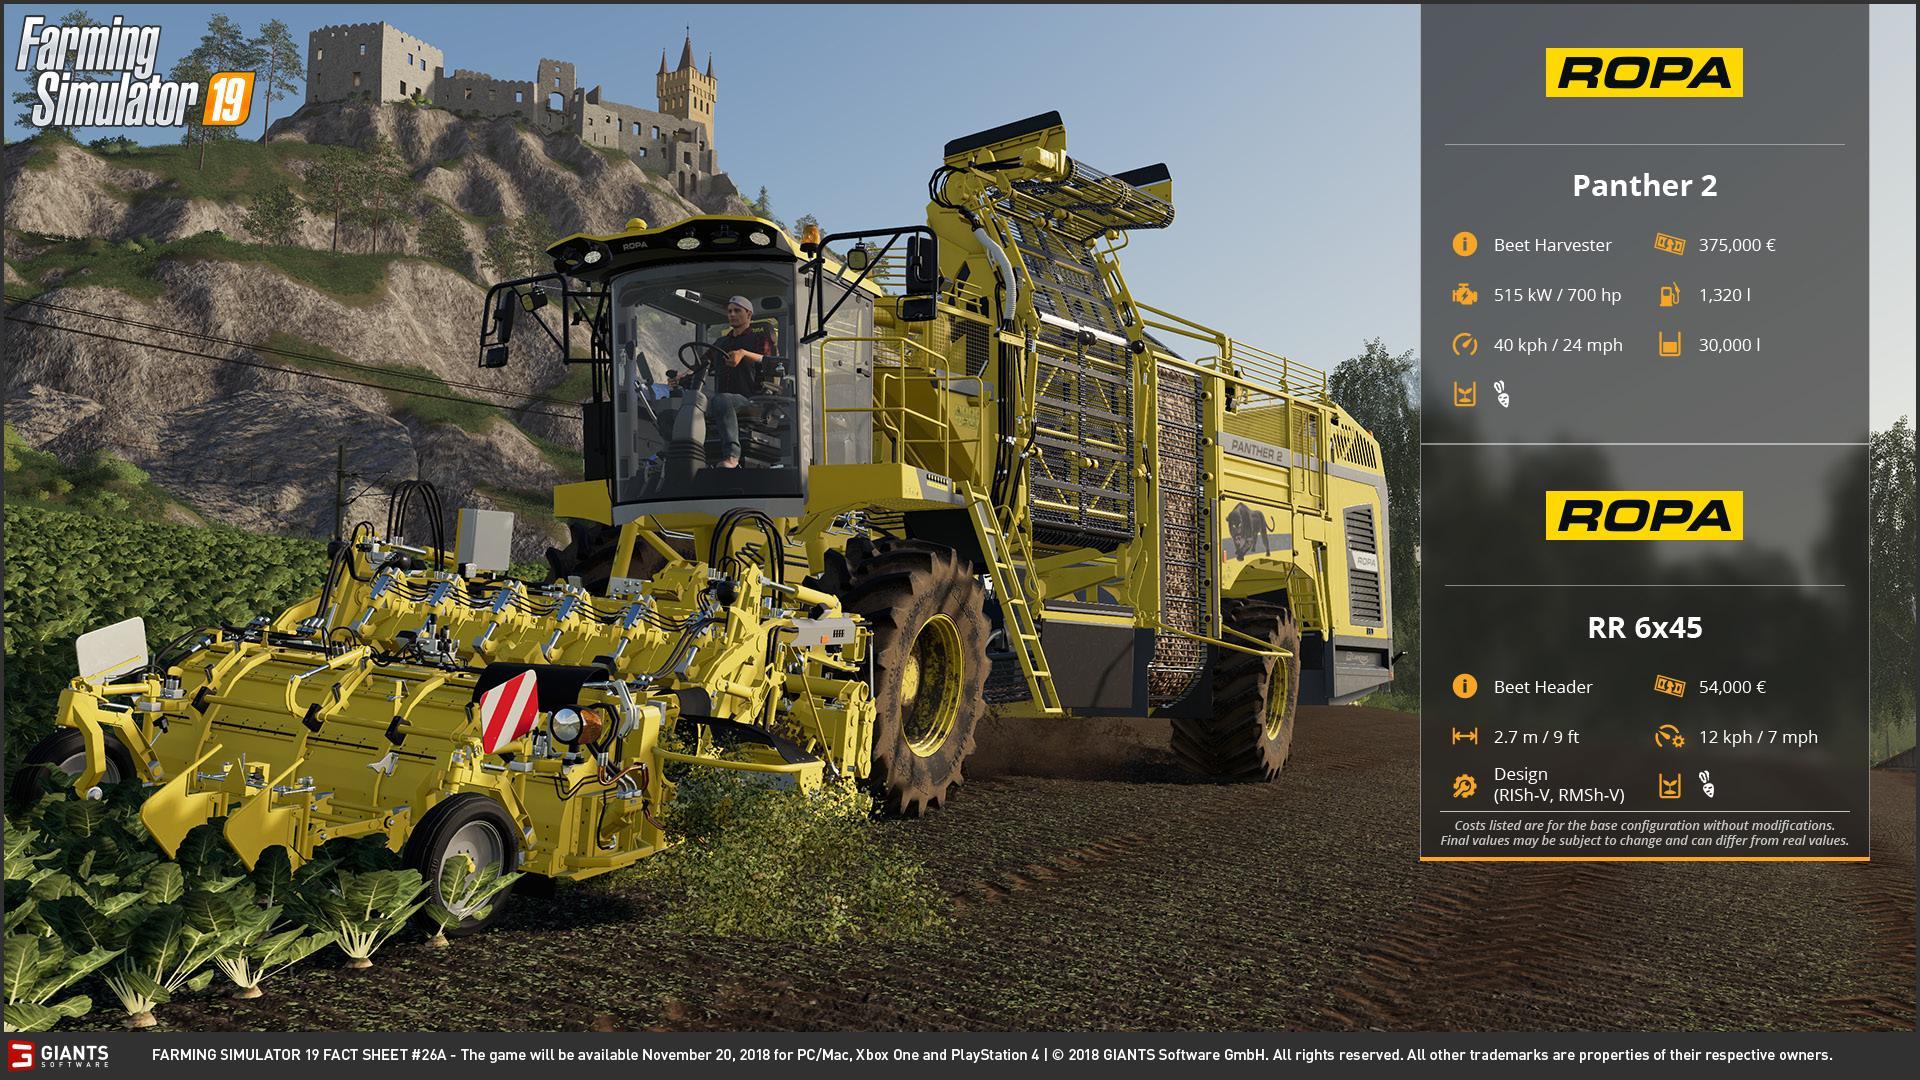 Euro truck simulator 2 for macbook pro